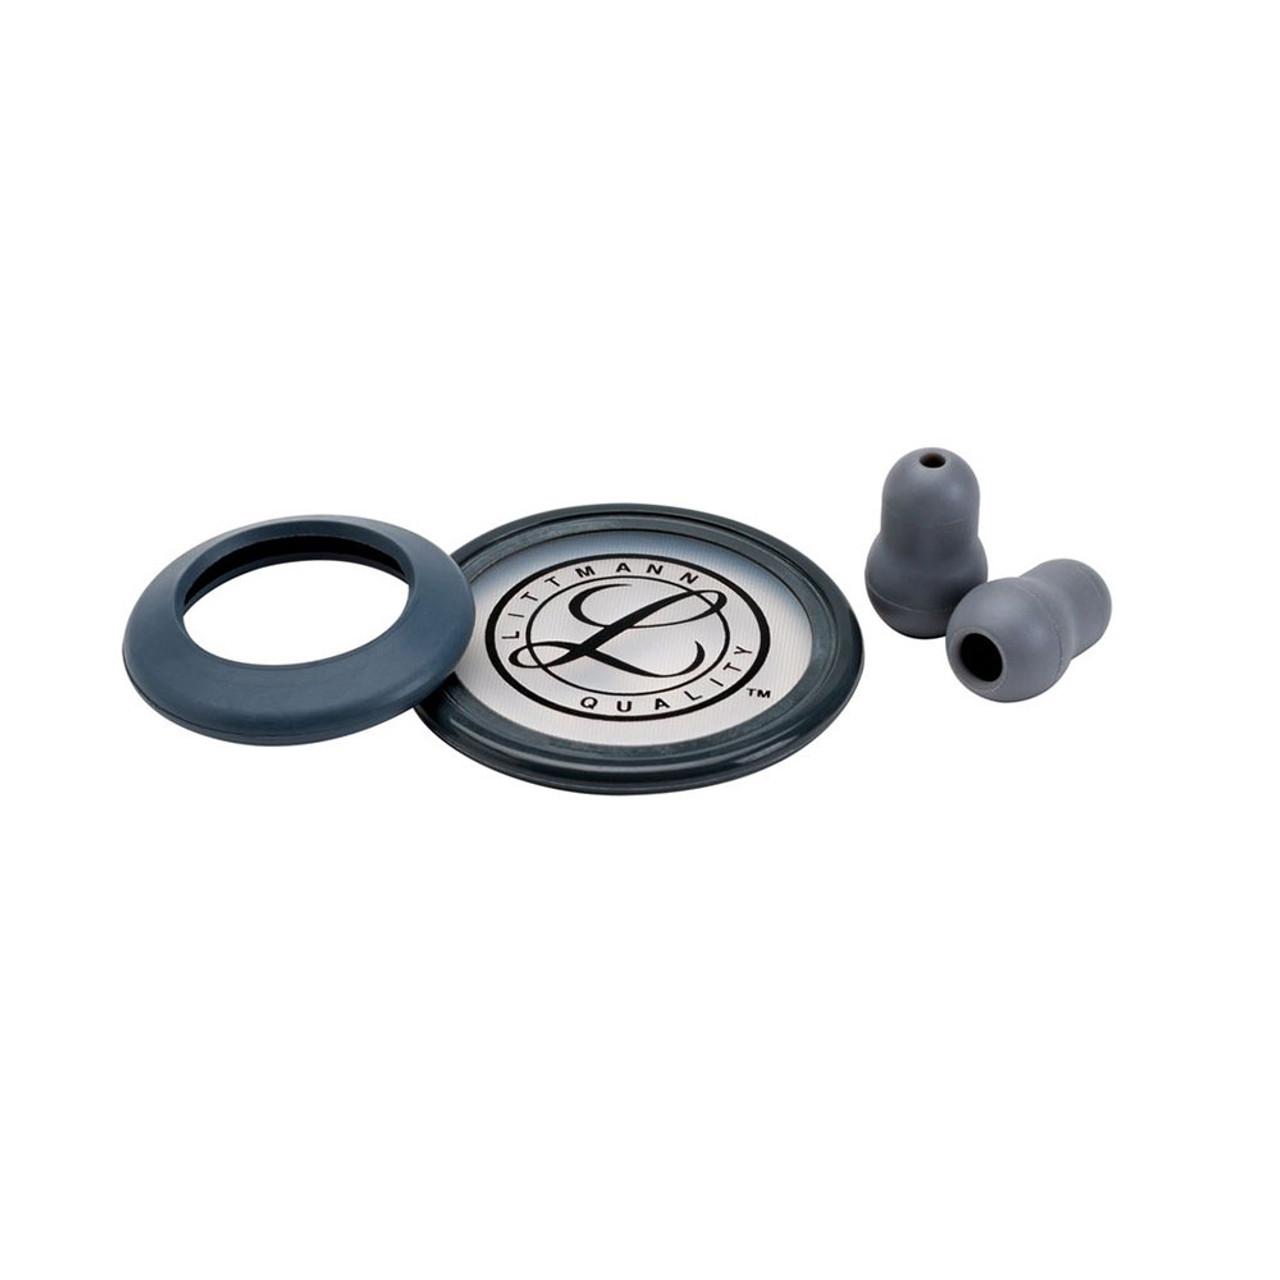 Littmann Stethoscope Spare Parts Kit, Classic II SE, Gray, 40006